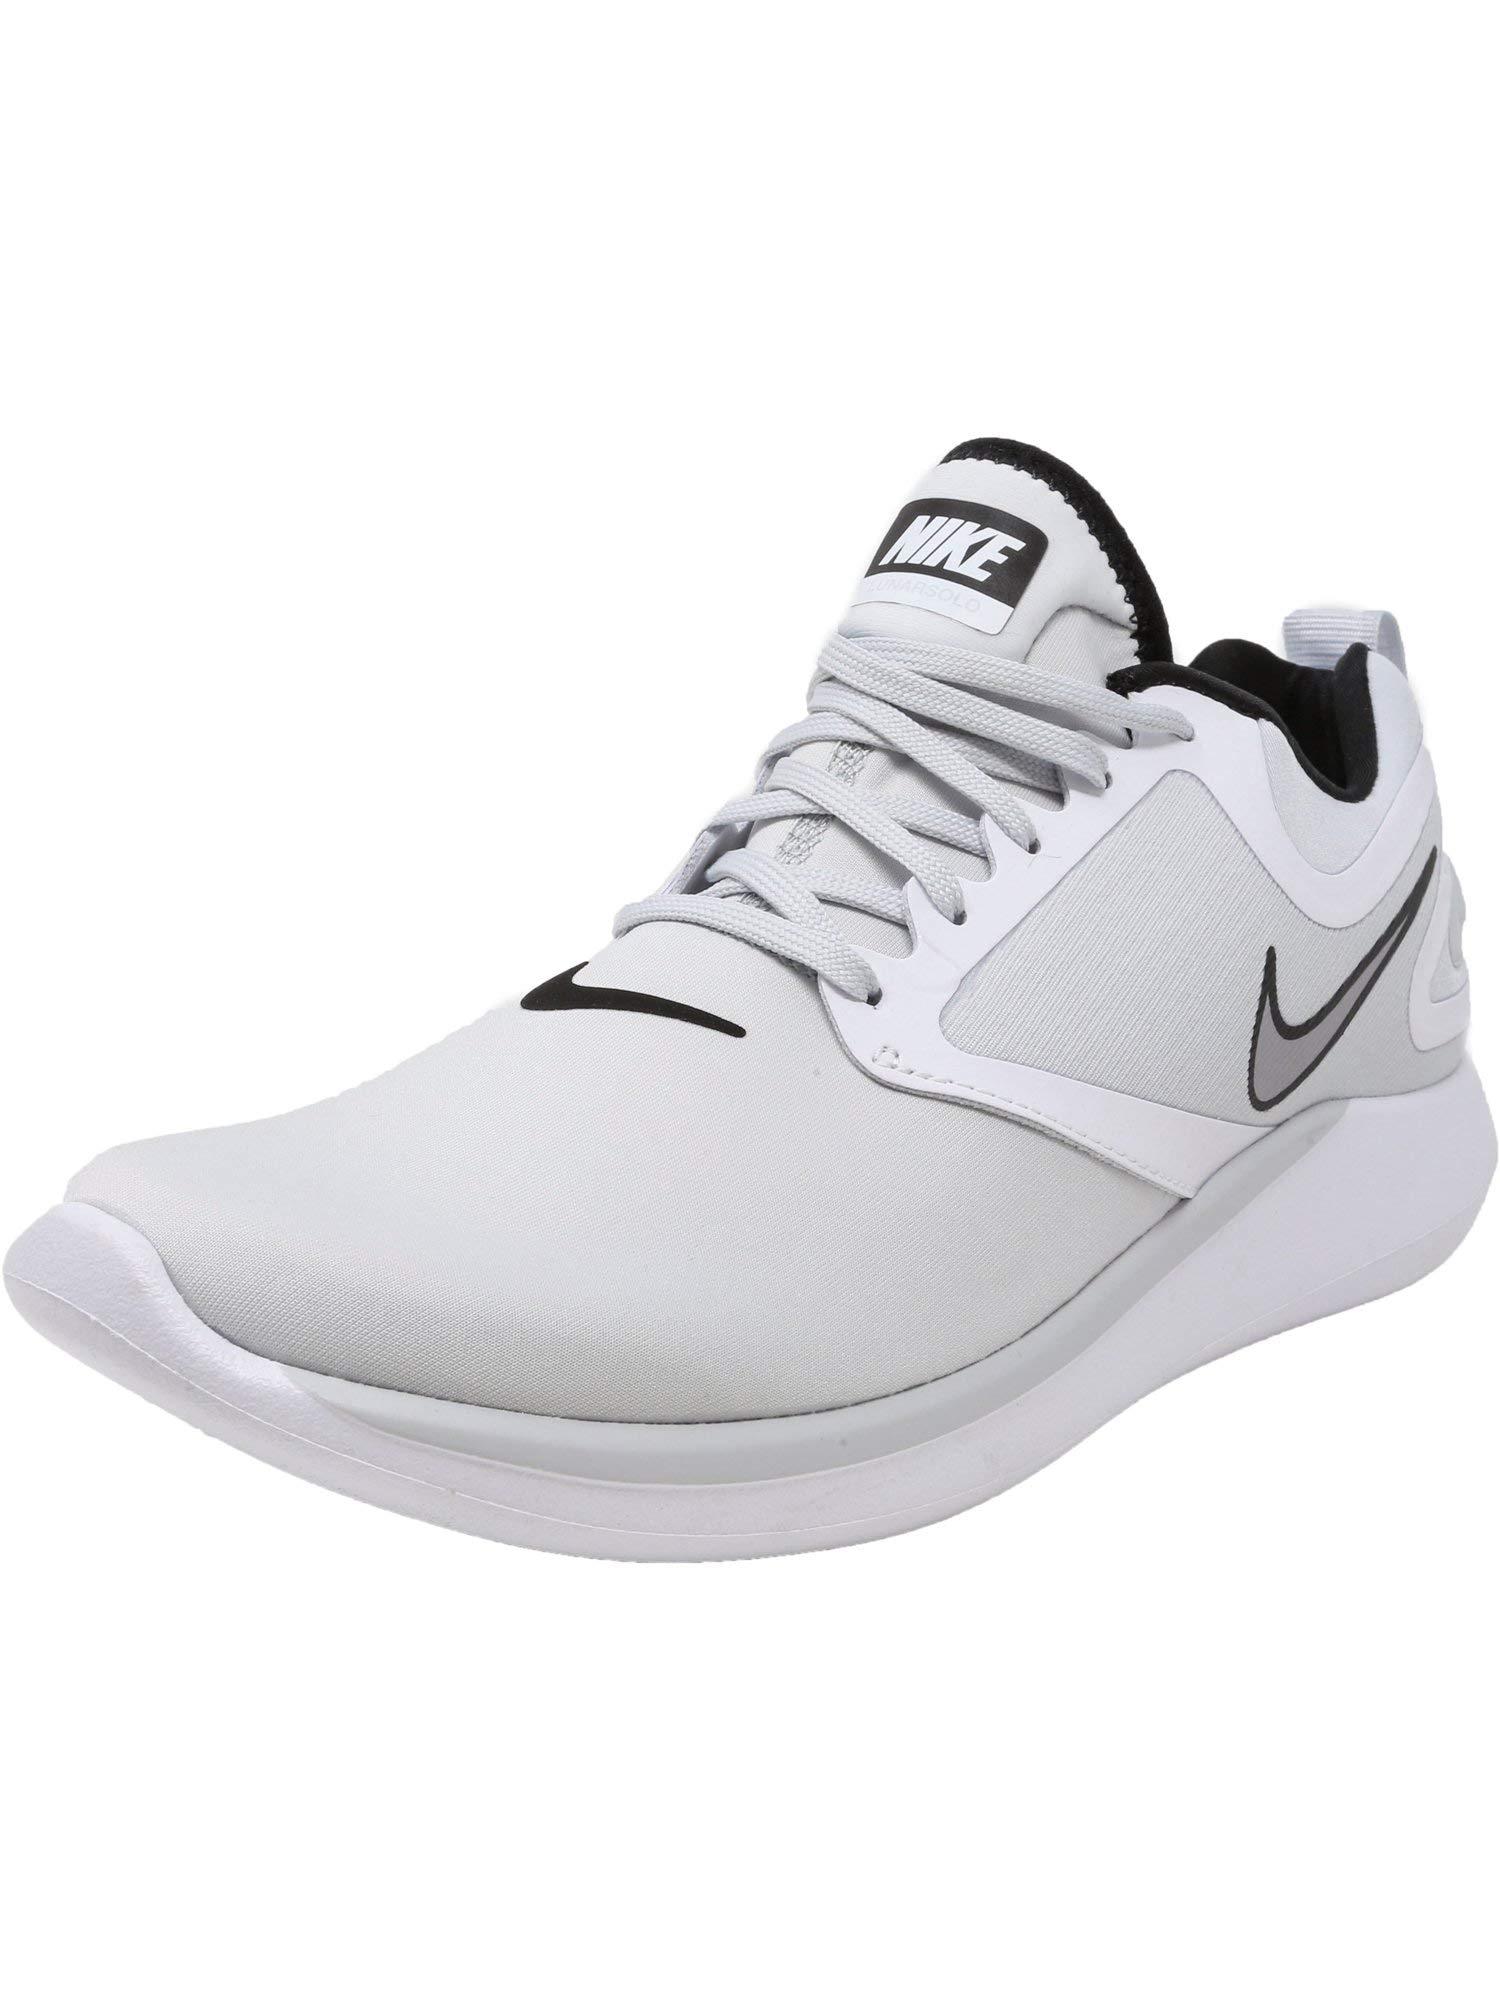 3c1ff69b4fe Galleon - Nike Men s Lunarsolo Pure Platinum Wolf Grey-White Ankle-High Running  Shoe - 10.5M